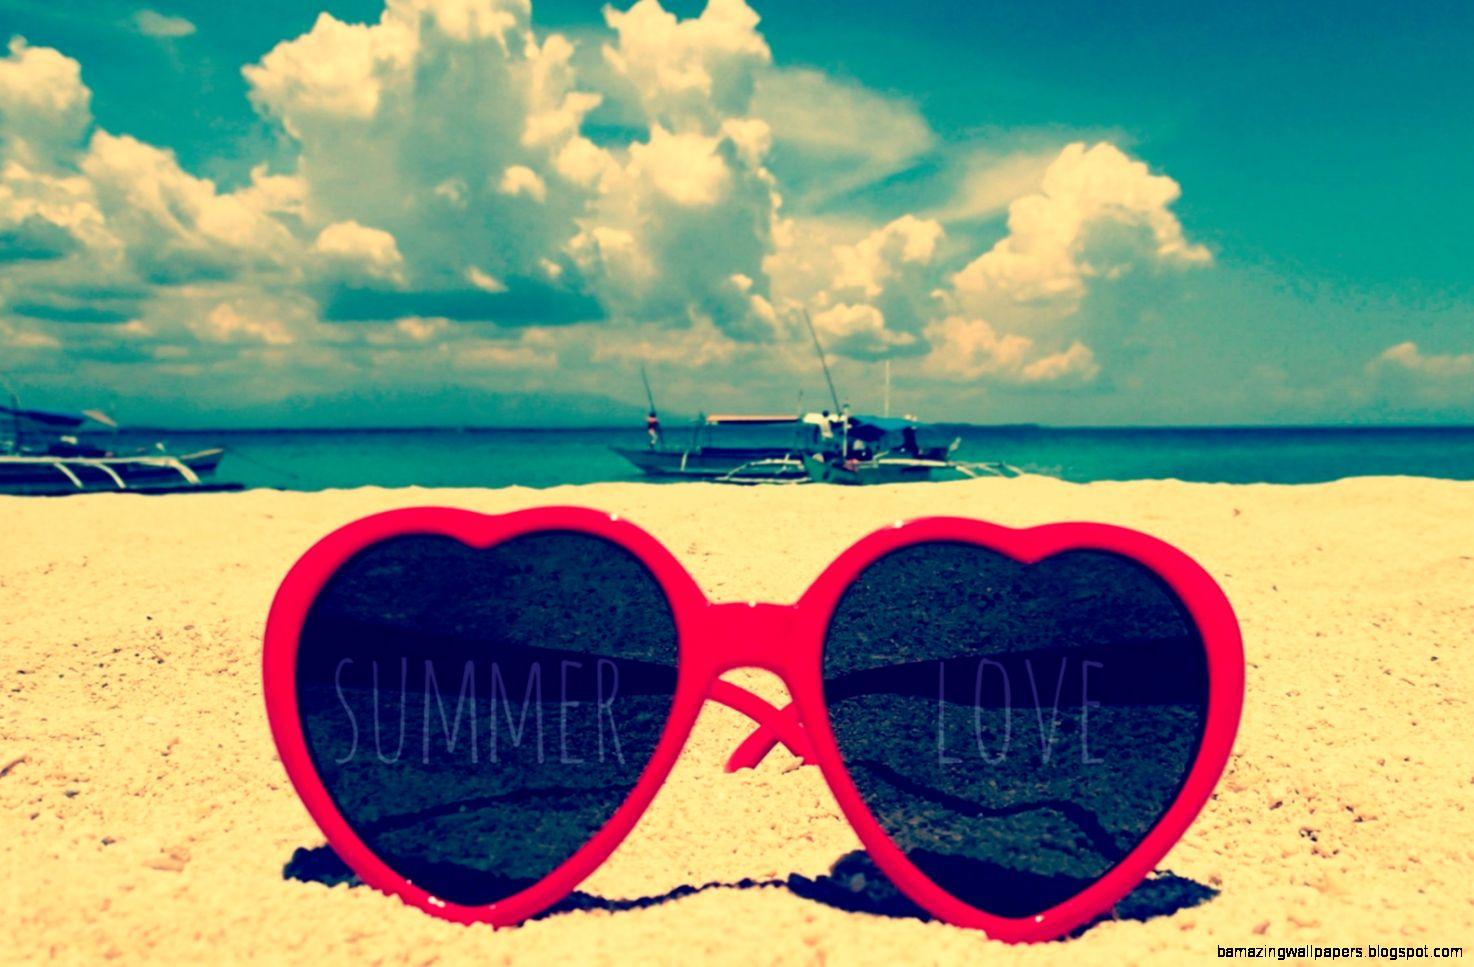 View Original Size Free Cute Summer Wallpaper Wallpapersafari Image Source From This